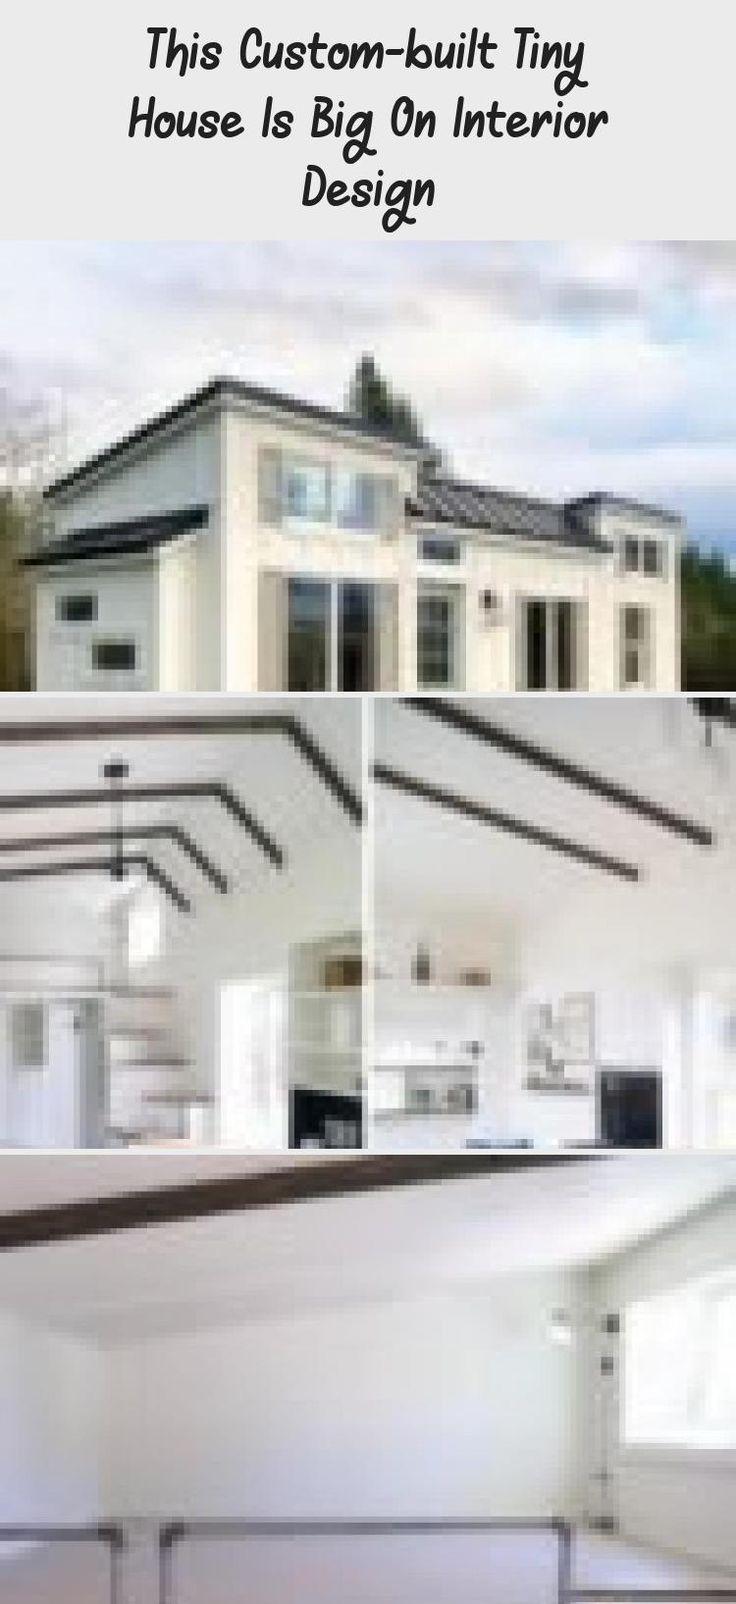 #designerinterior  #interiordesignKitchen  #interiordesignForSmallSpaces  #Frenchinteriordesign  #interiordesignArt  #interiordesignFurniture #custom-built #tiny  This custom-built tiny house is big on interior design